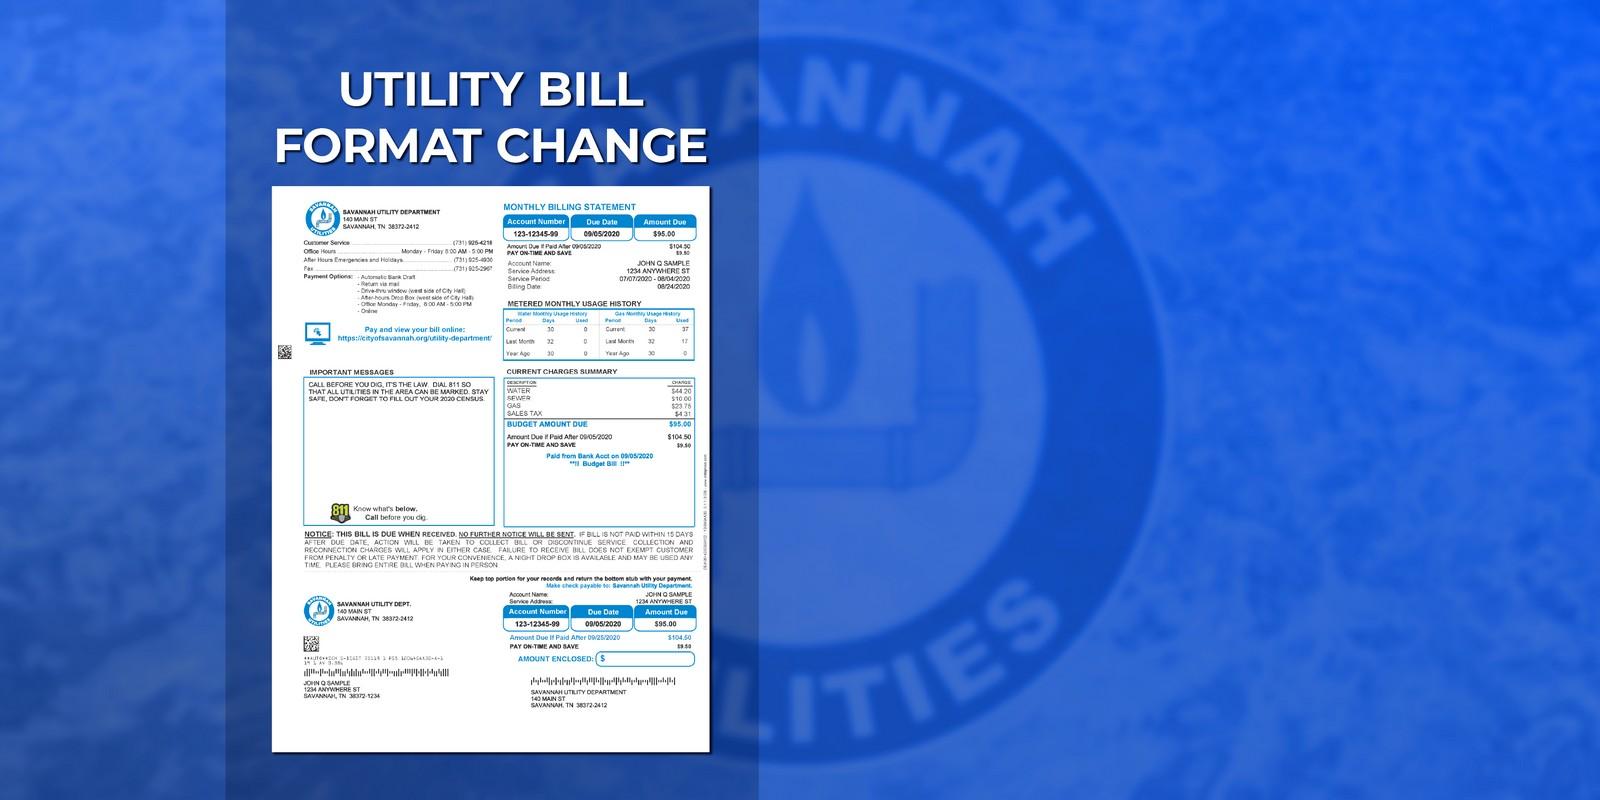 Savannah Utility Department – Utility Bill Format Change